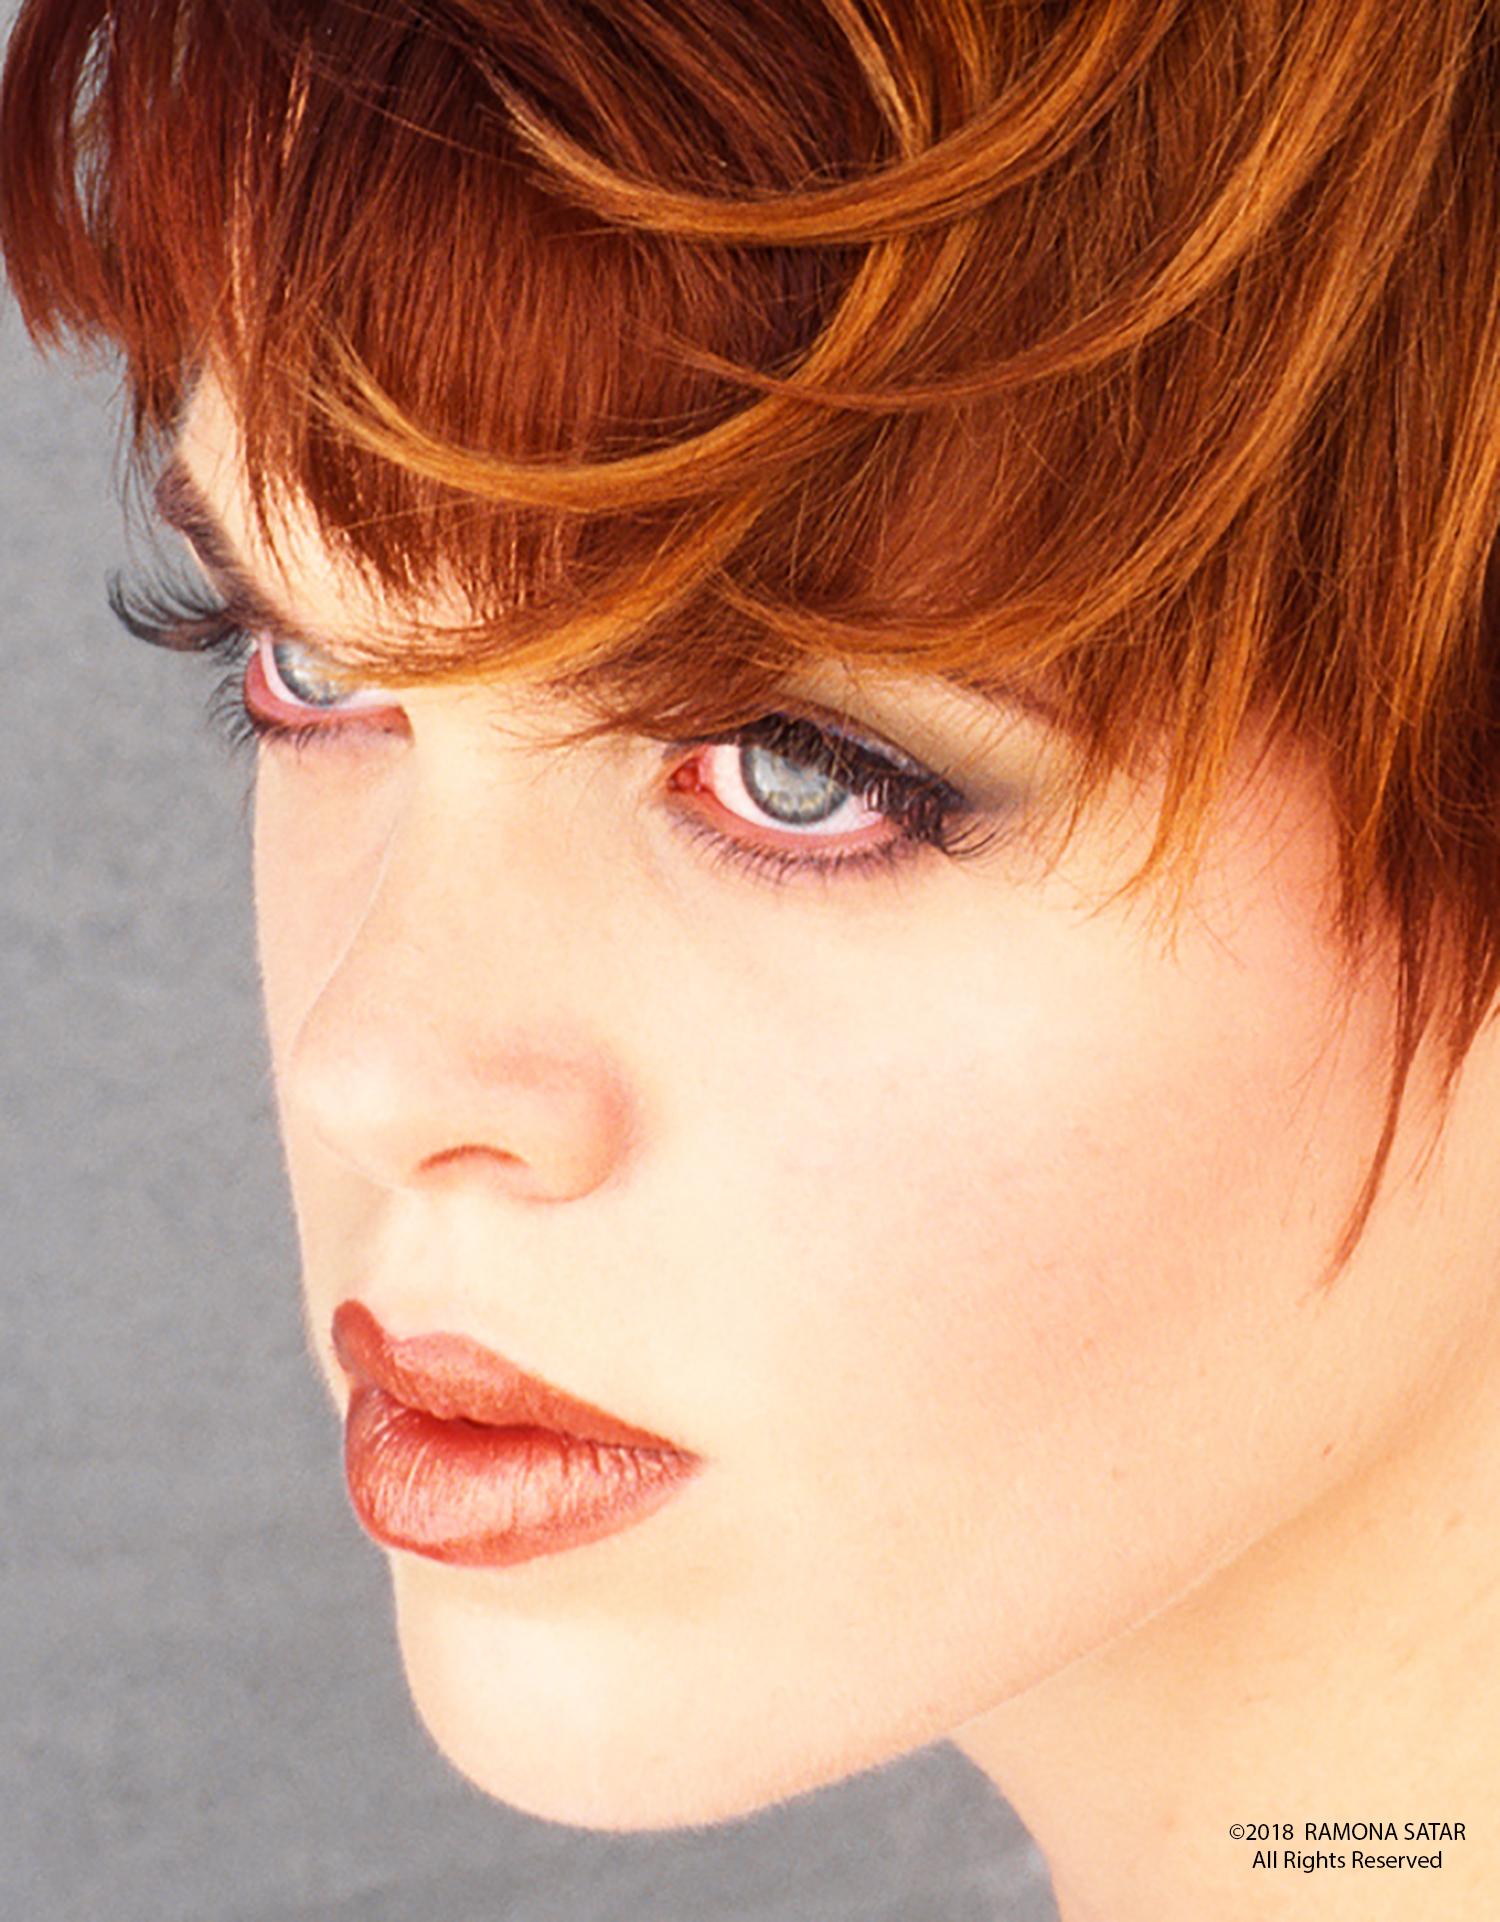 Ramona Satar Amber_03.jpg